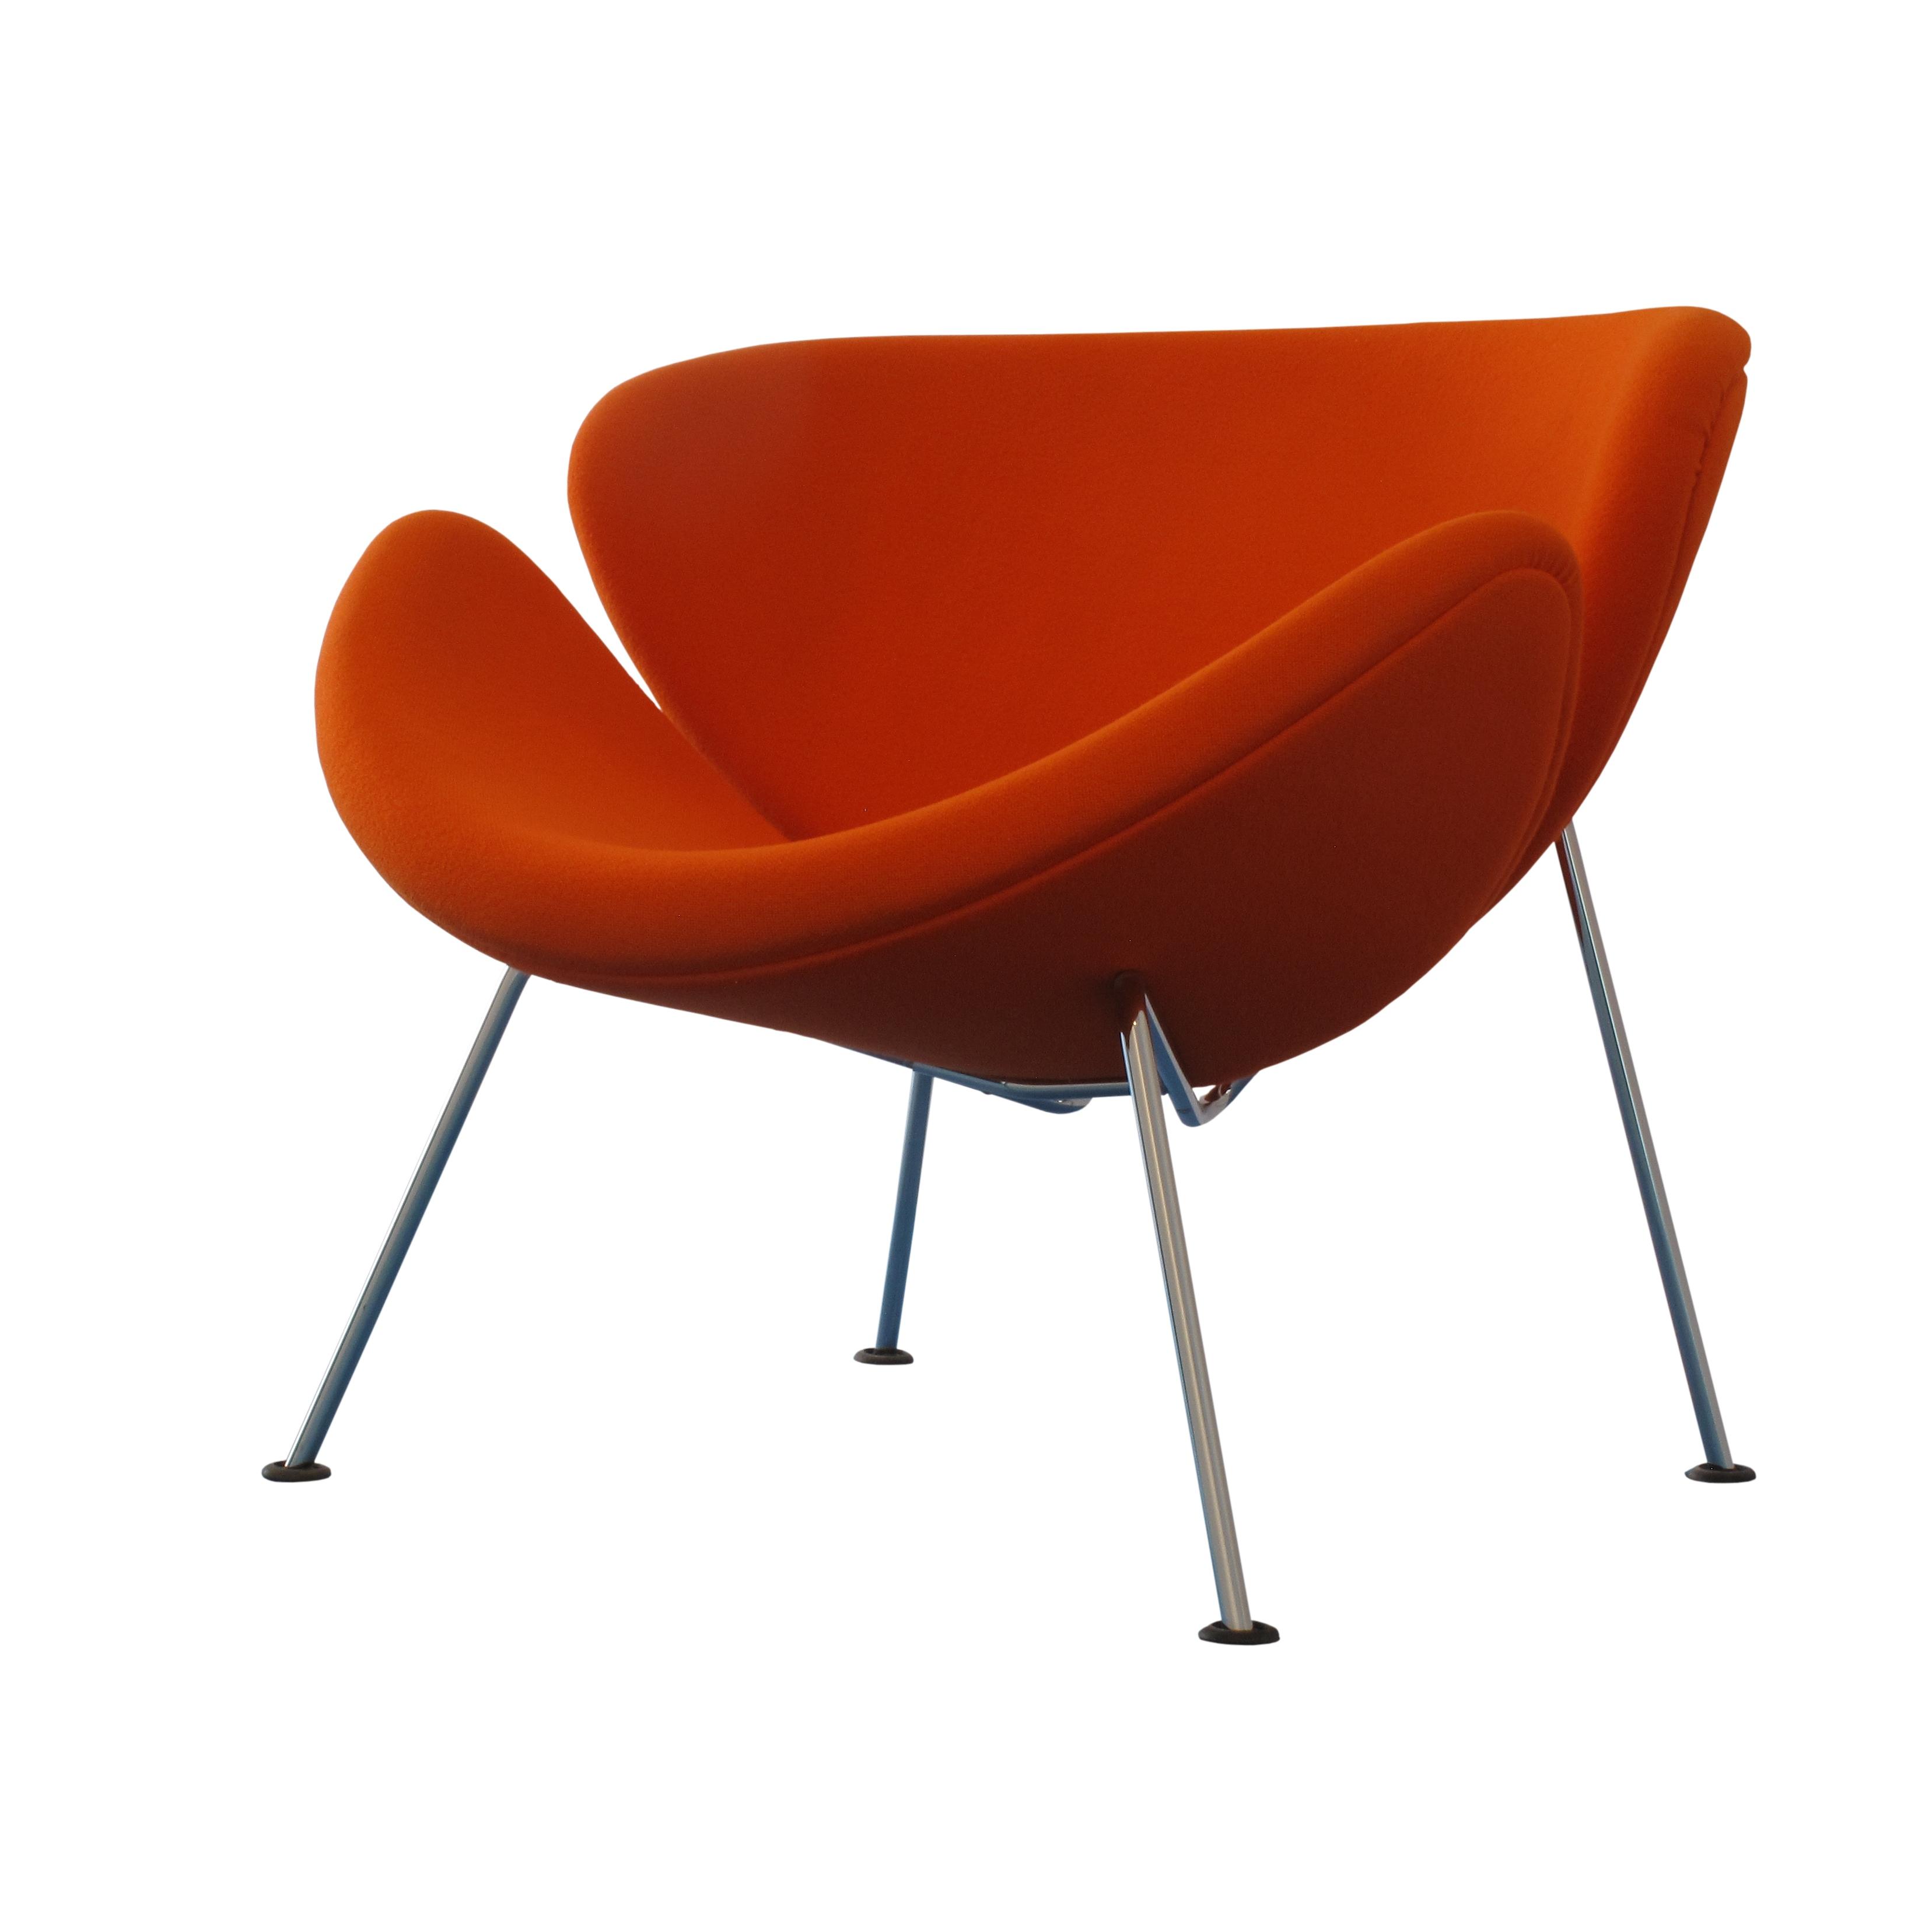 orange slice chair woven lounge file pierre paulin img 5833 white jpg